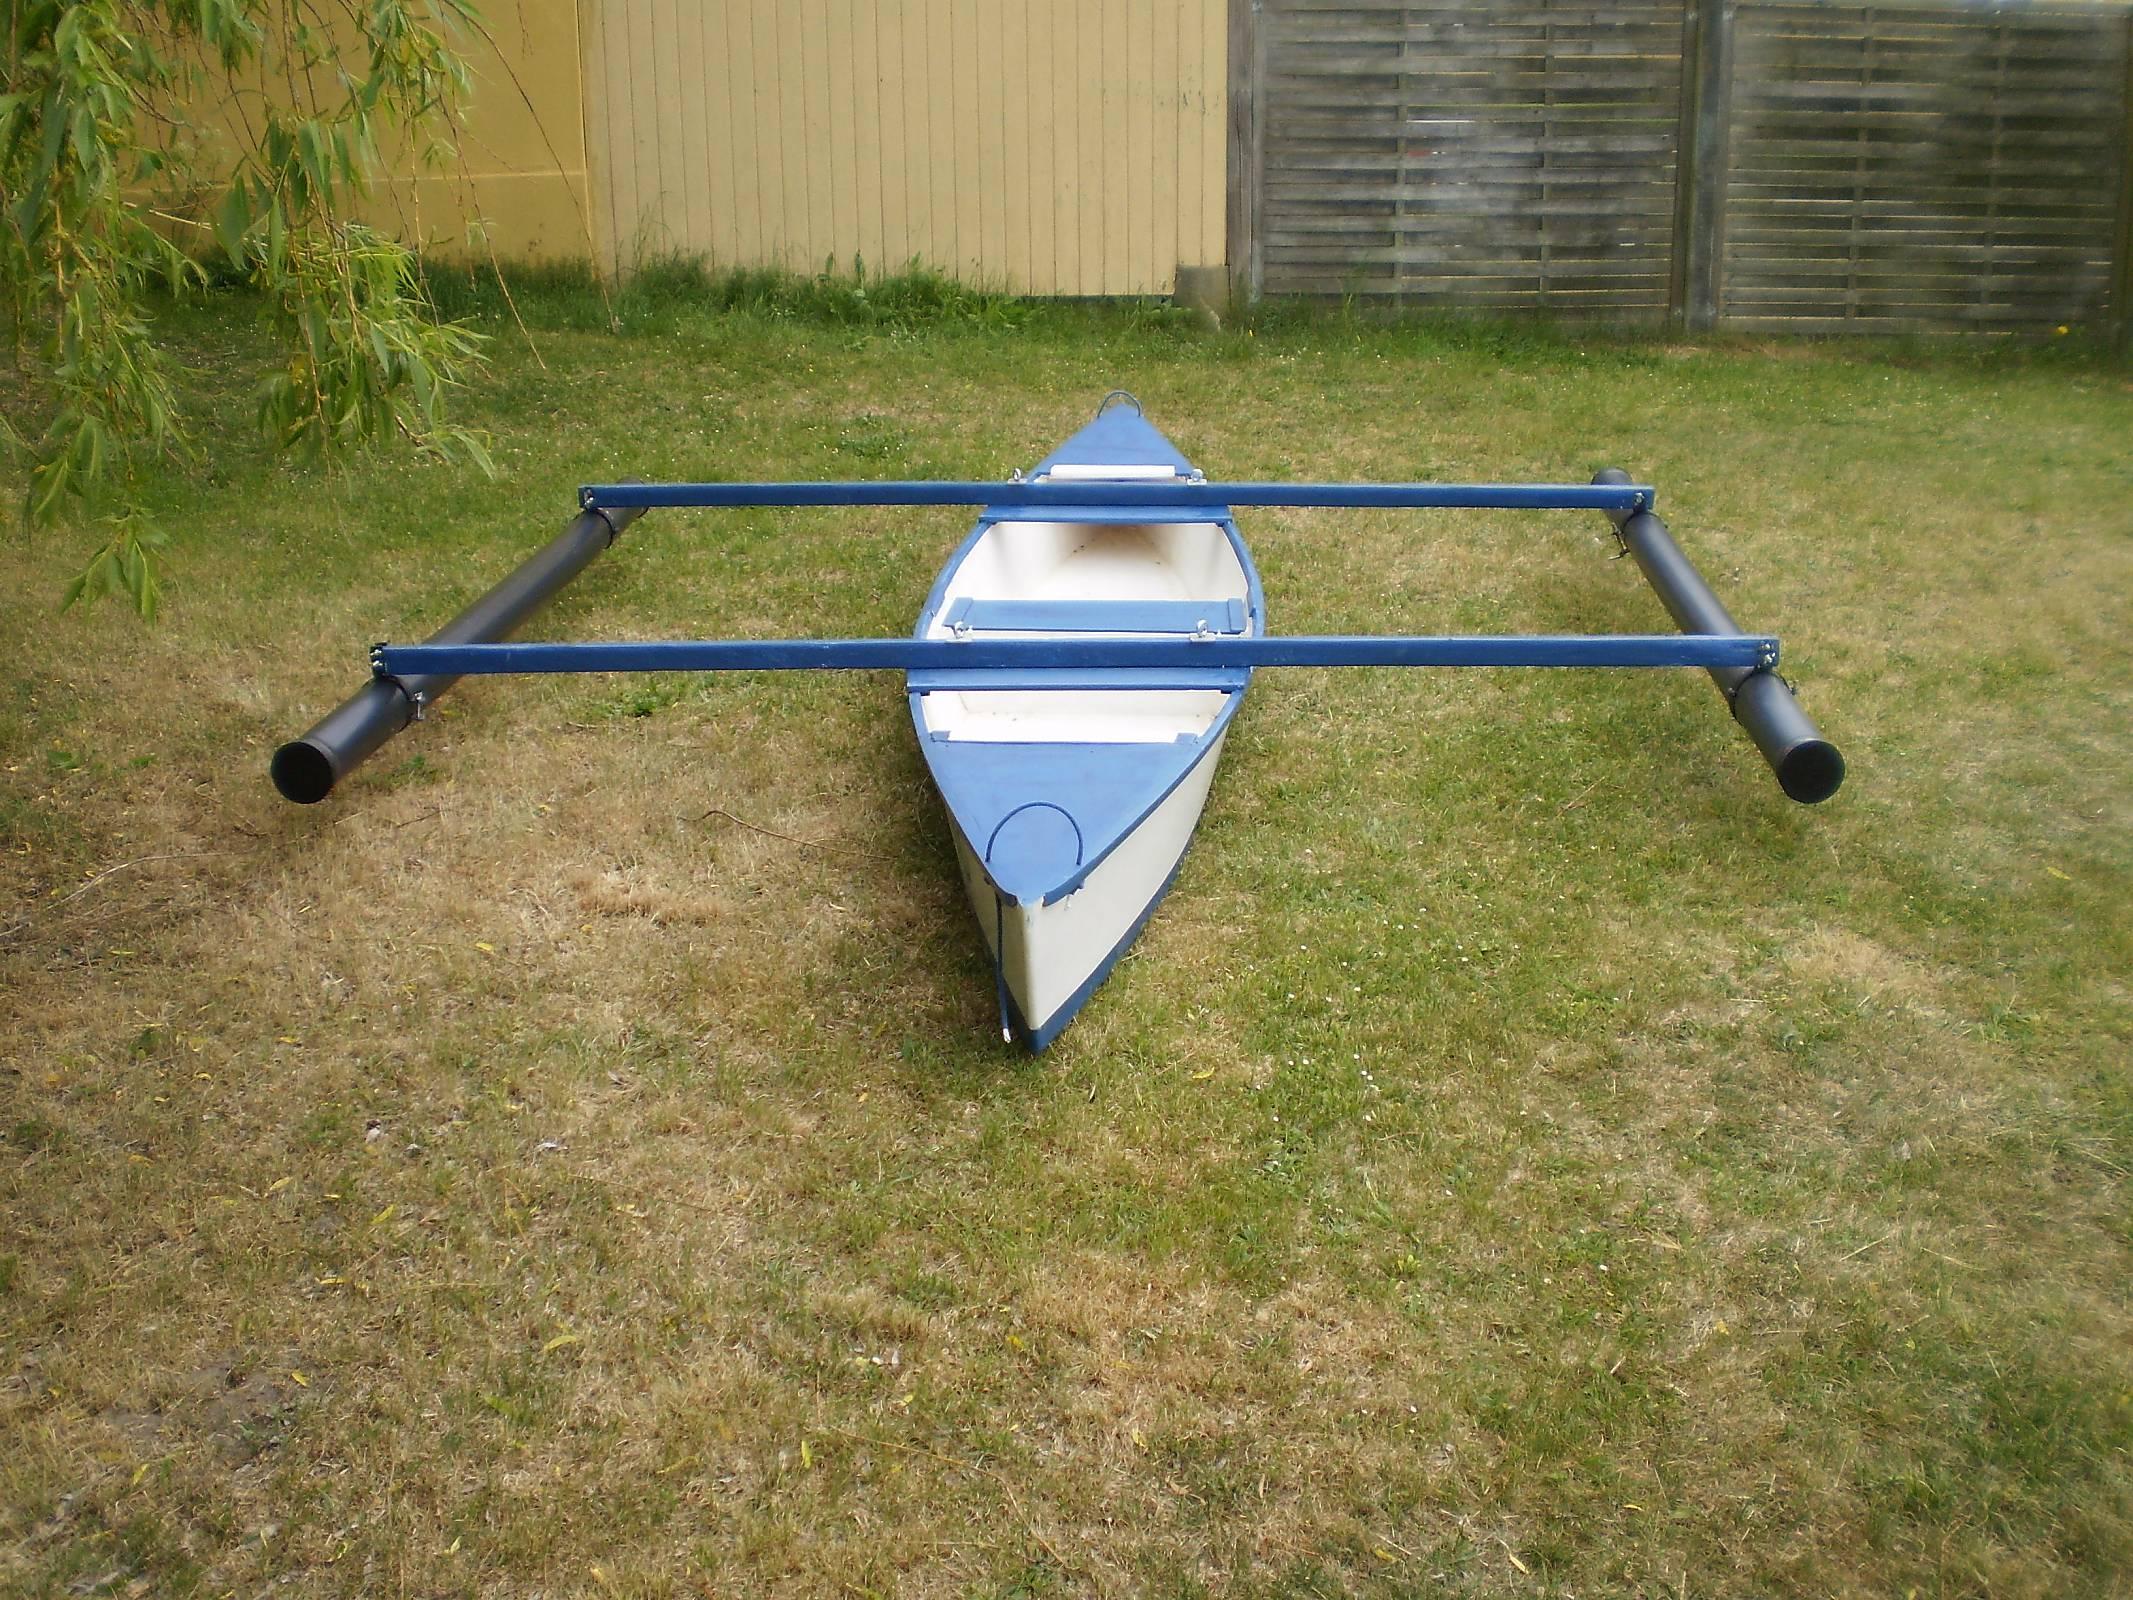 v-shape vs flat bottom vs round shape | Boat Design Net